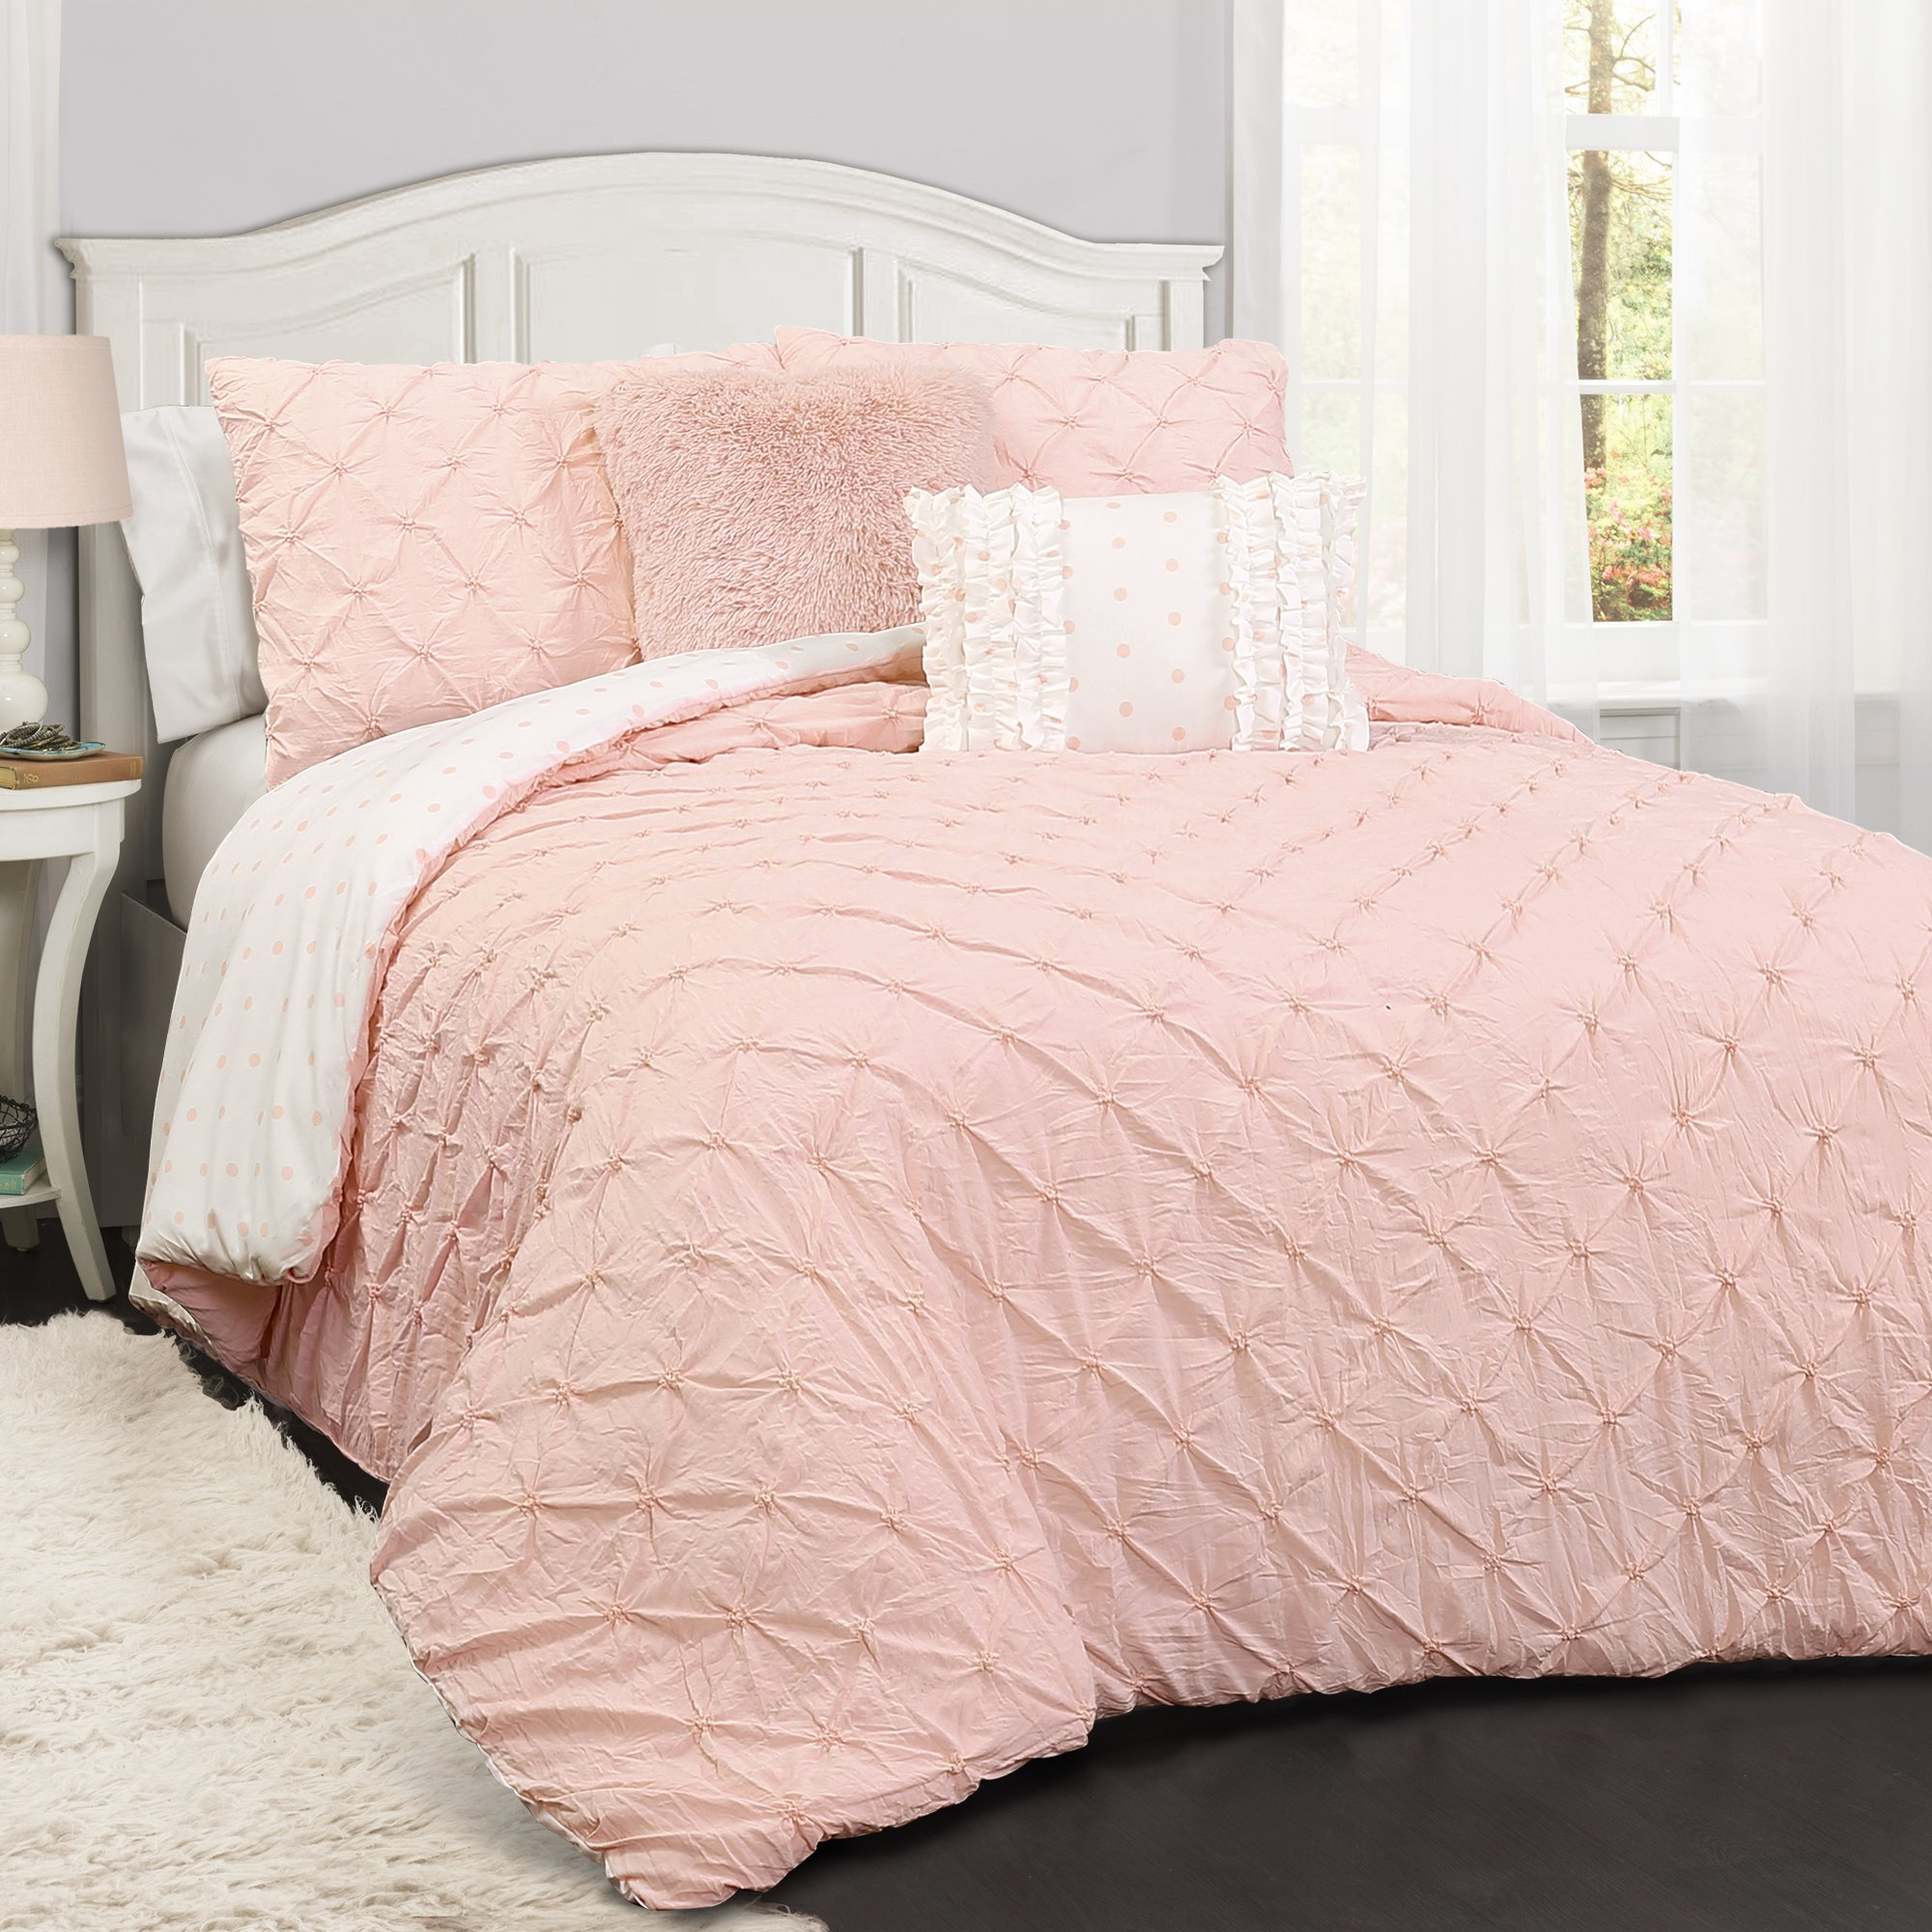 Lush Decor Ravello 4 Piece Comforter Set, Twin, Pink